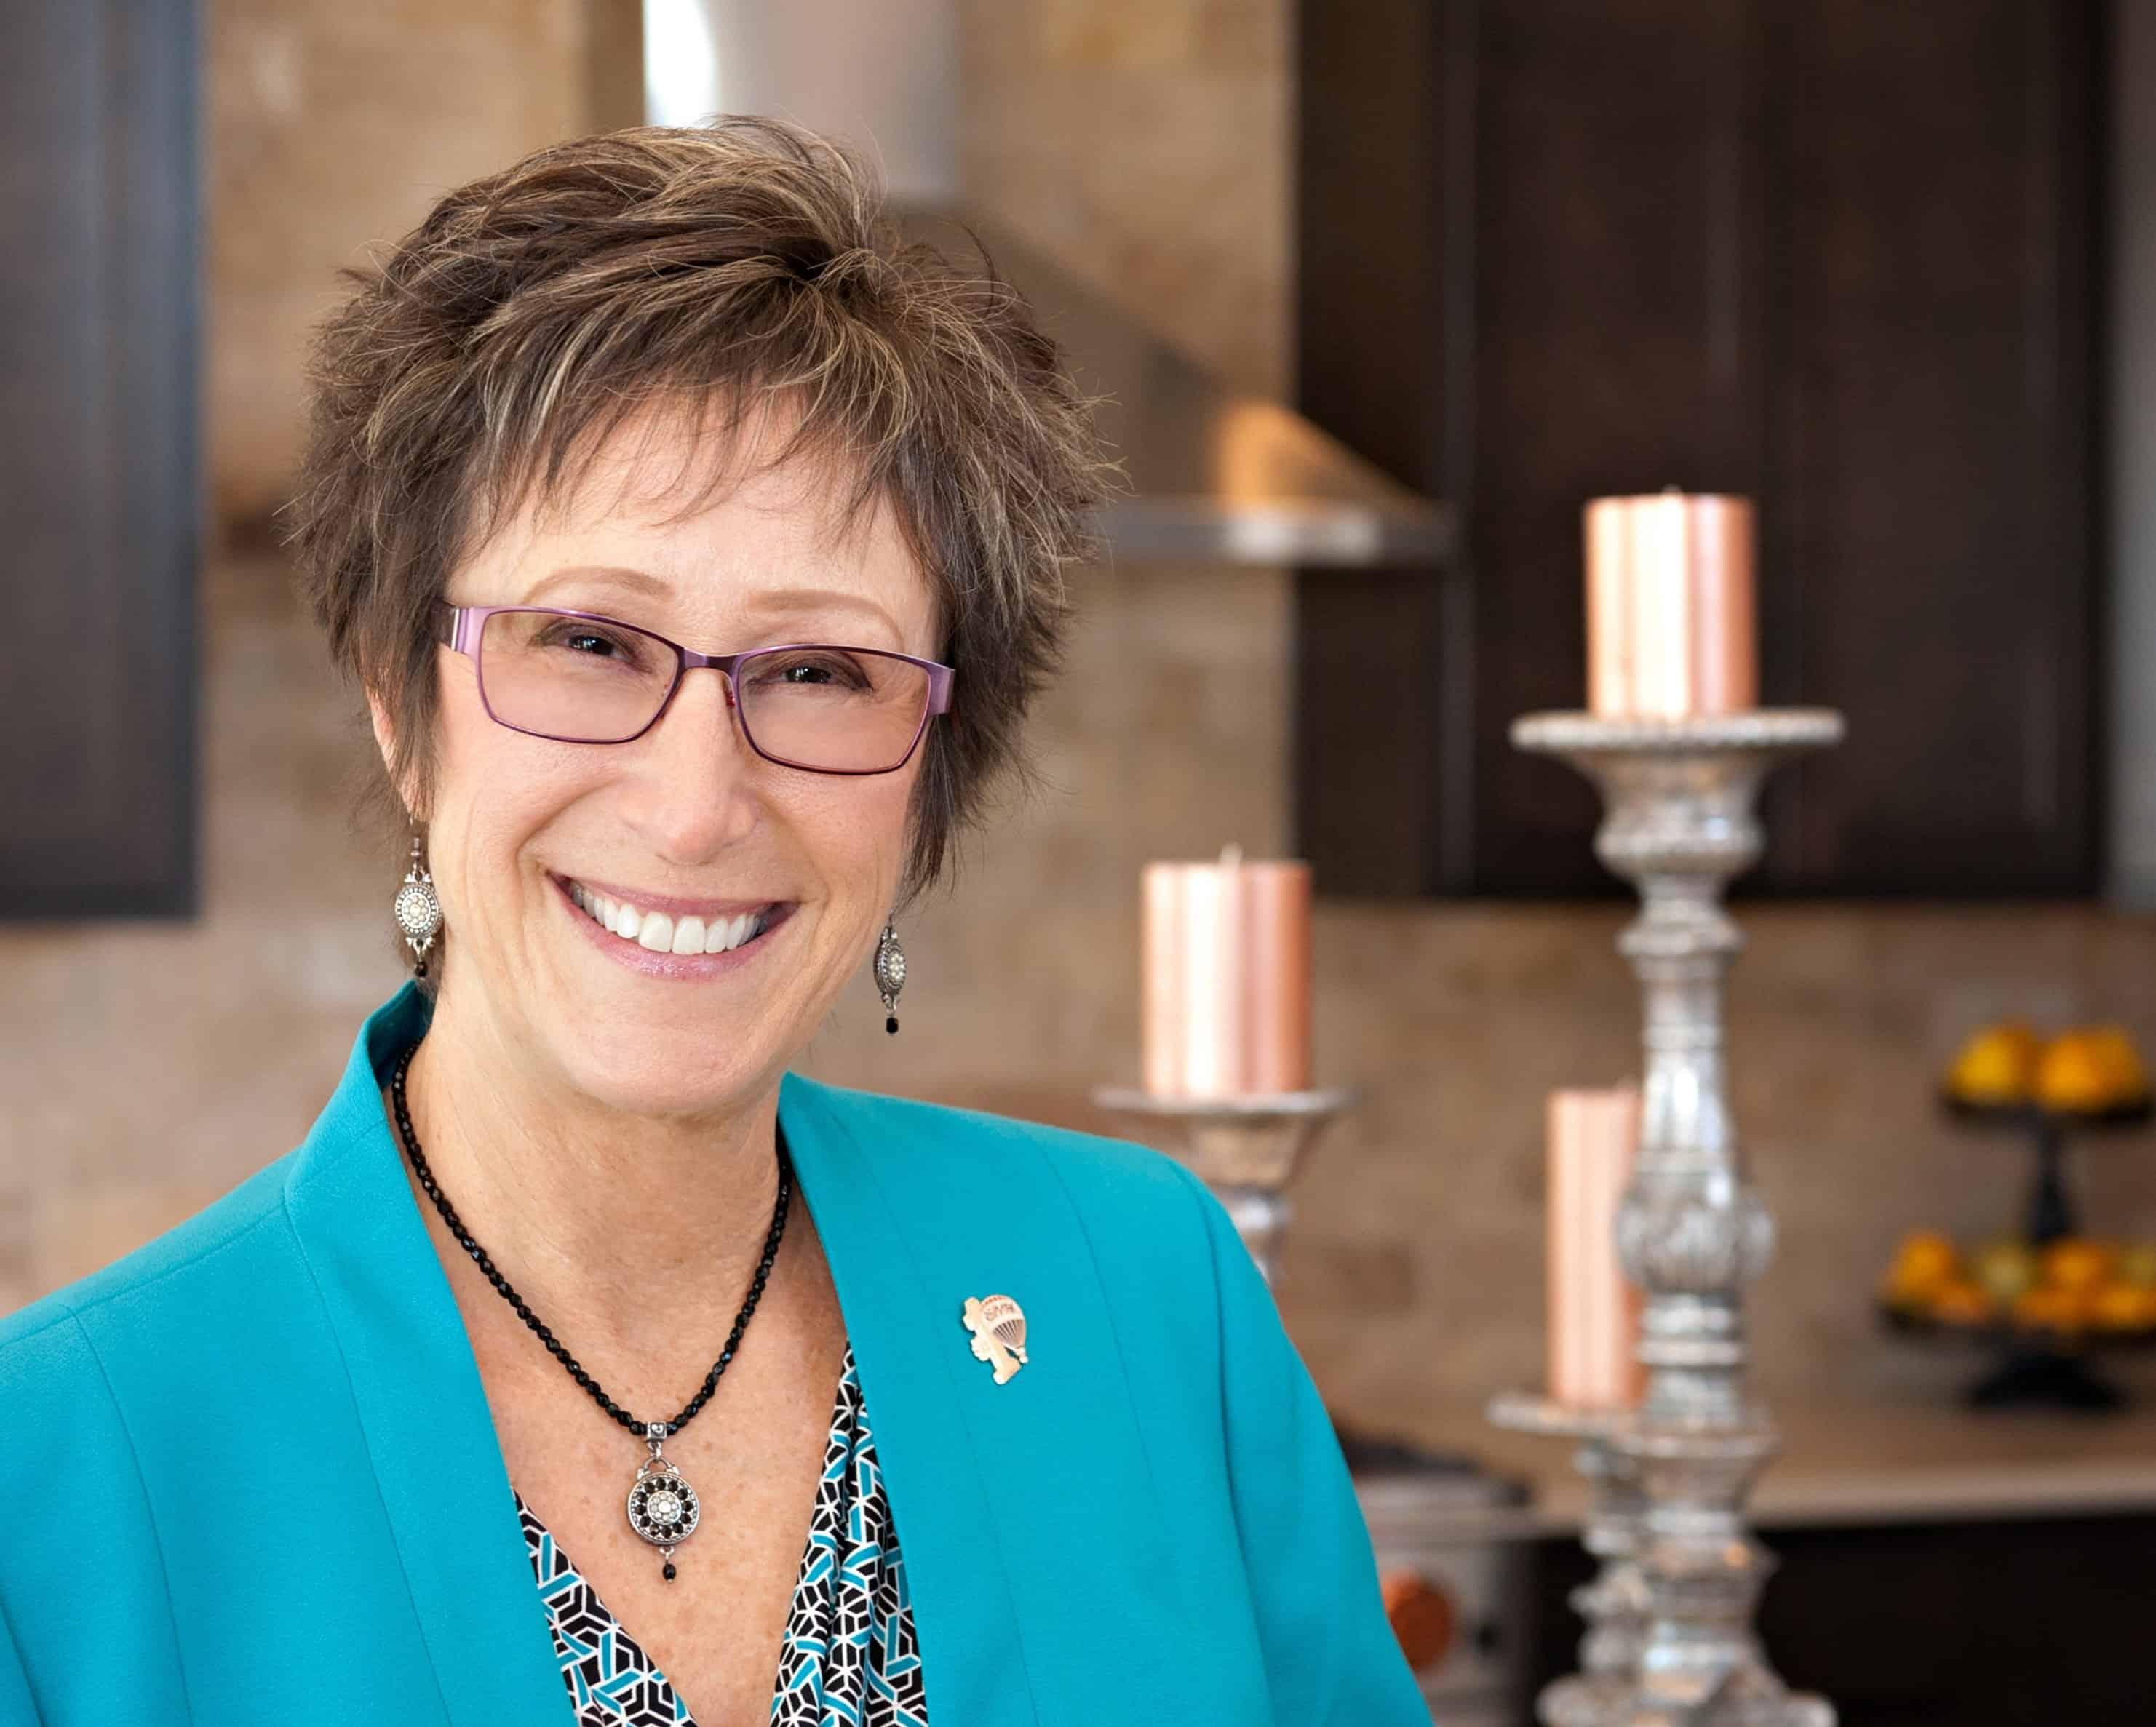 RE/MAX Realtor Vicki Westapher Commemorates 20th Anniversary in Real Estate